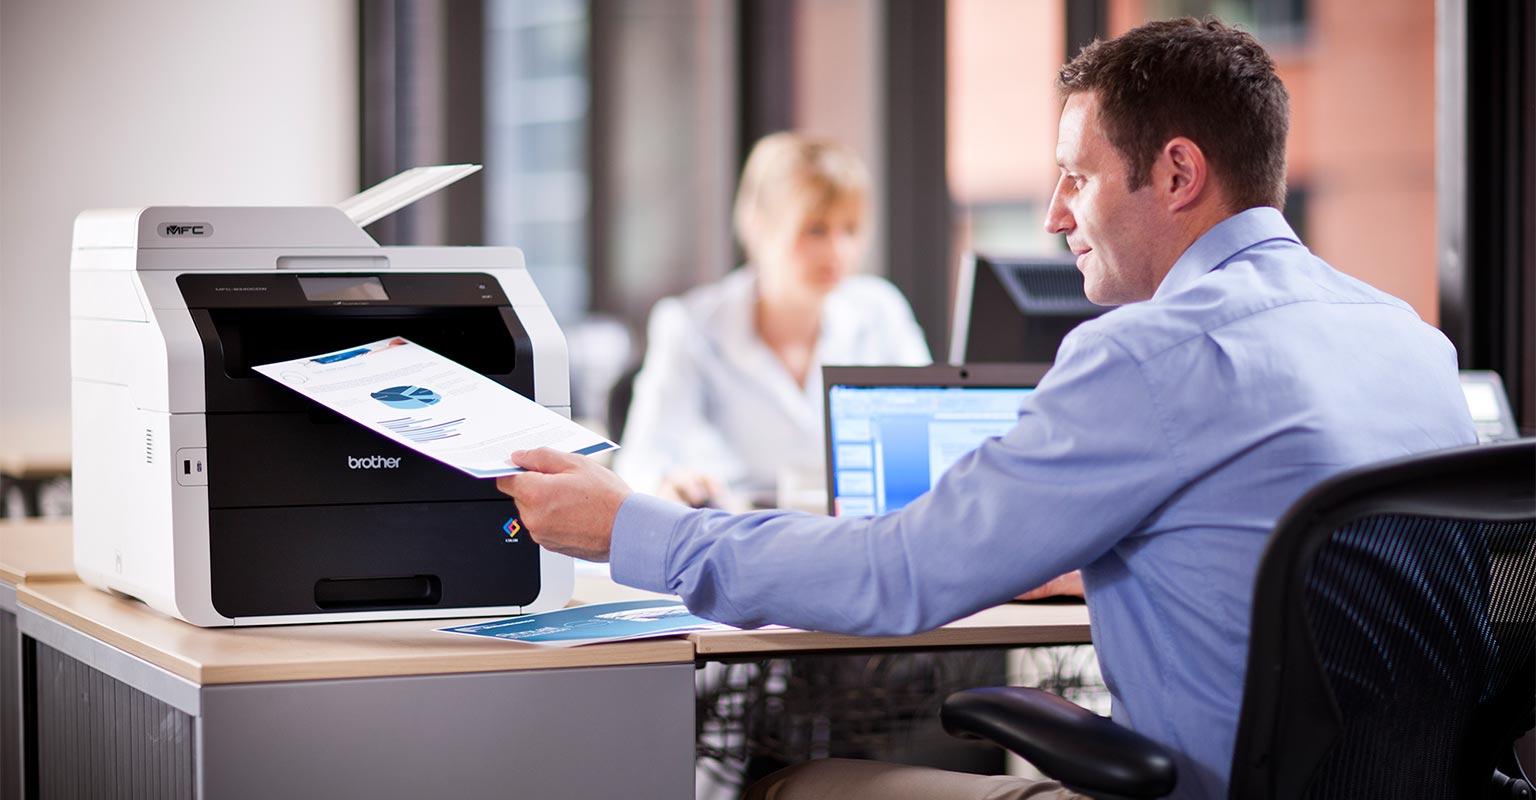 Printing a report of print jobs using printsmart